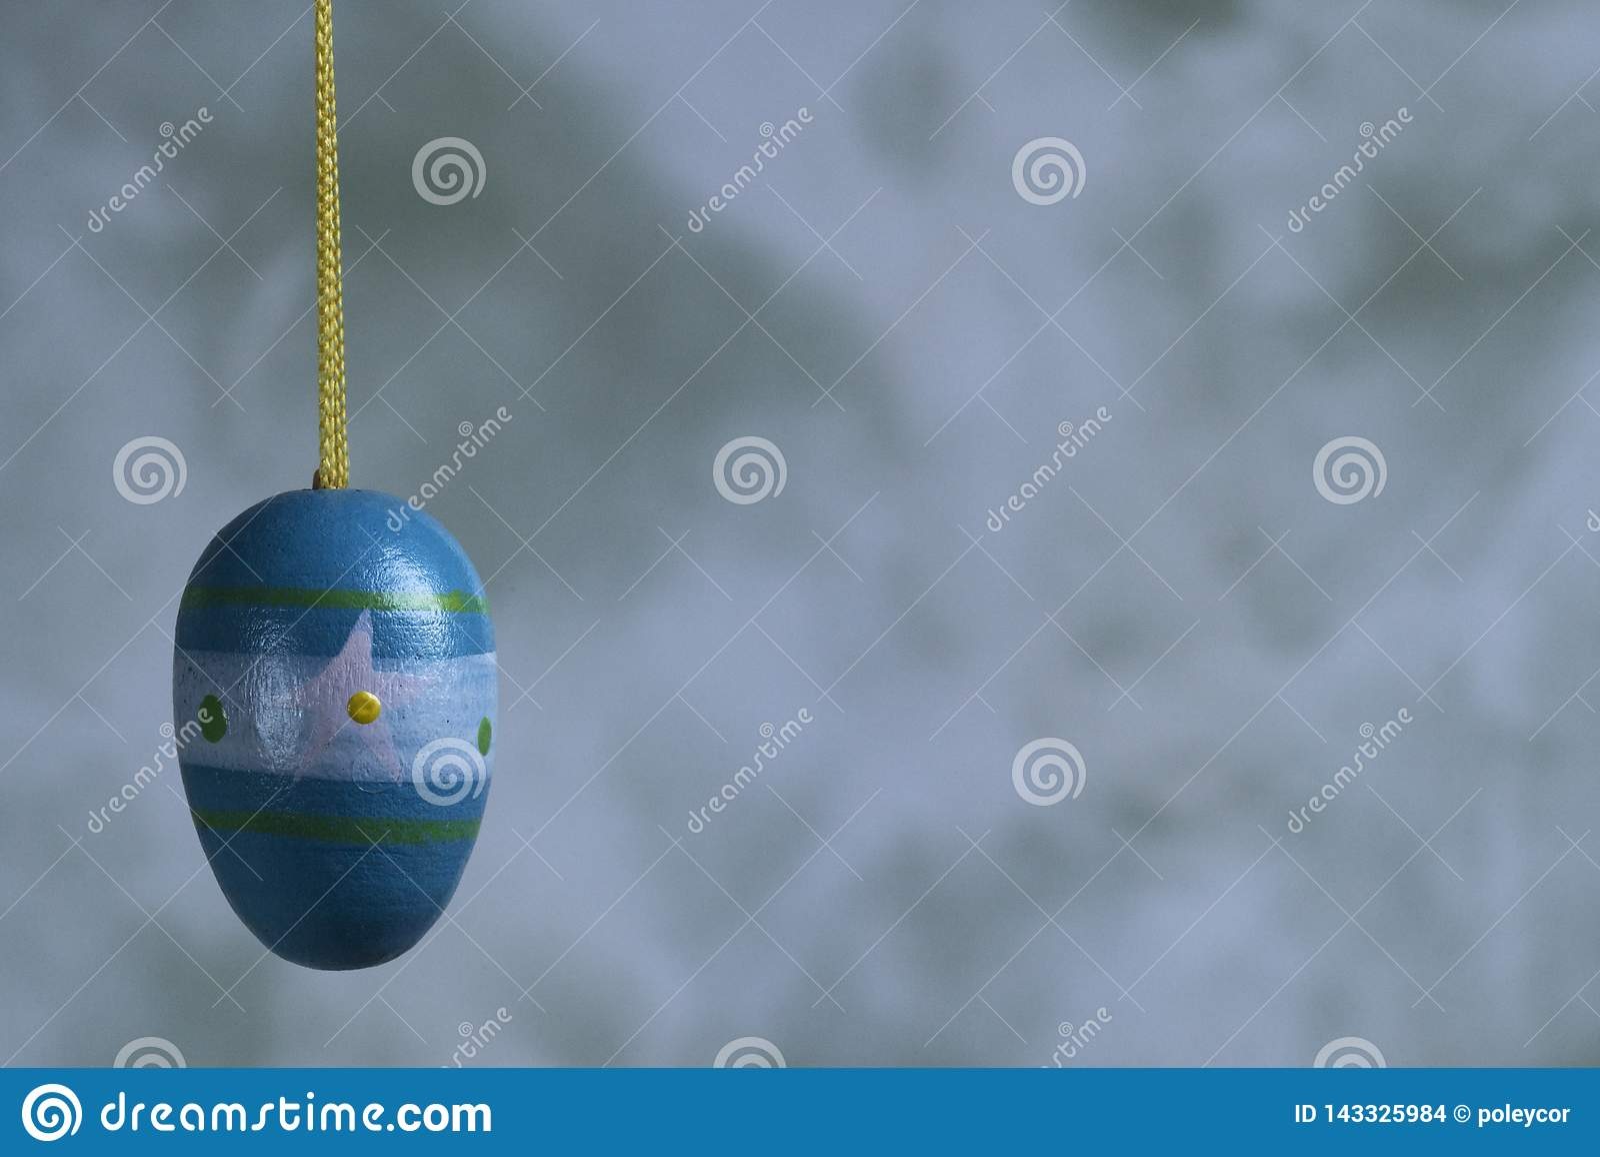 Ovo da páscoa de madeira pintado azul, contra o fundo ardido Espaço para o texto